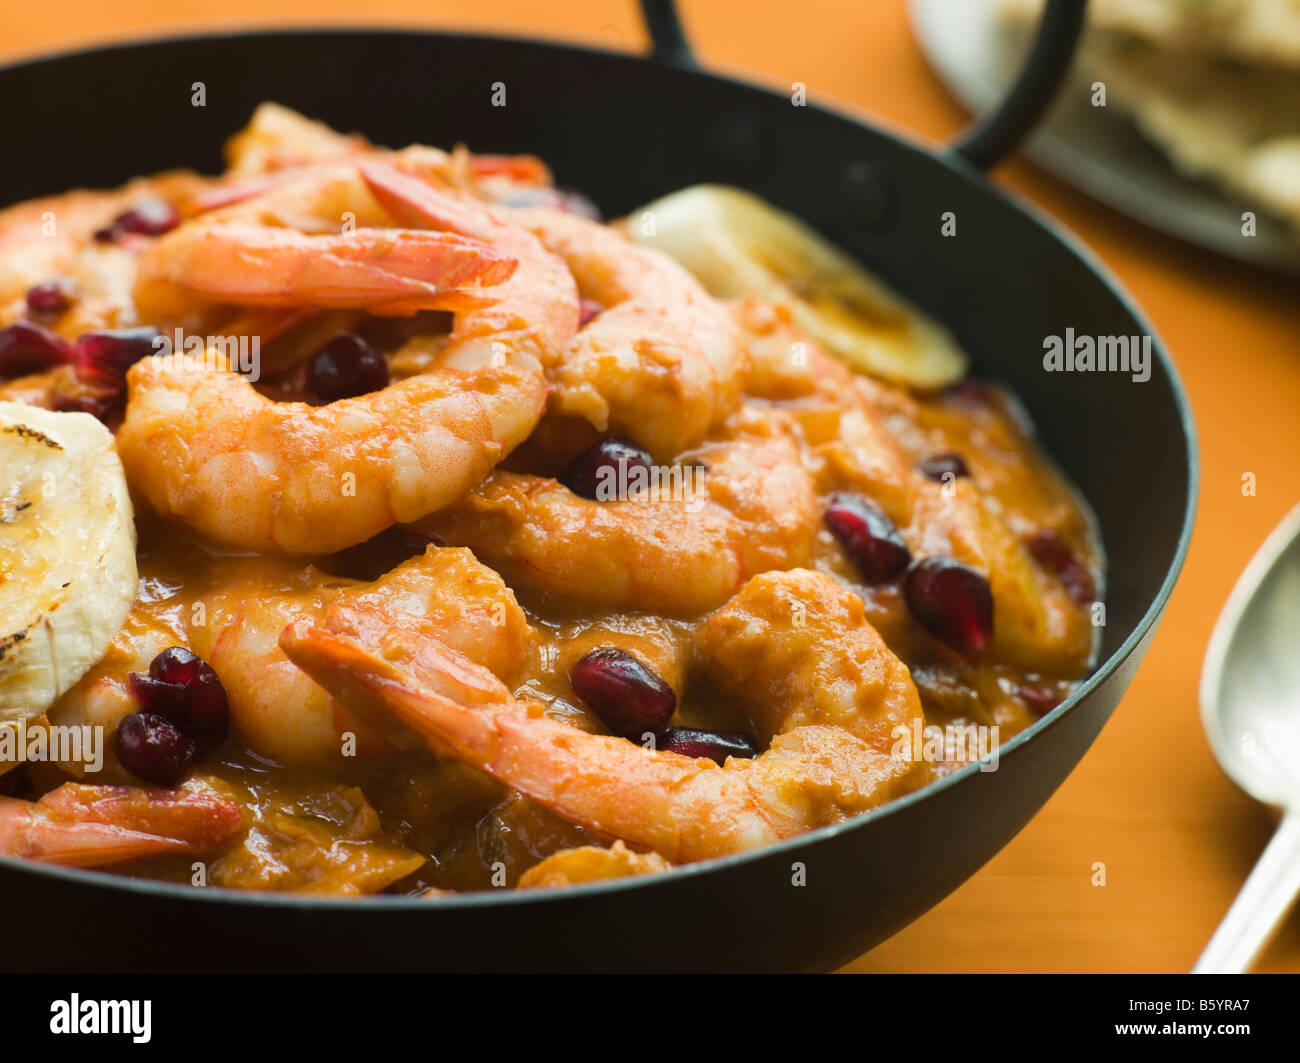 Karahi Dish with Kashmiri Tiger Prawn Curry - Stock Image